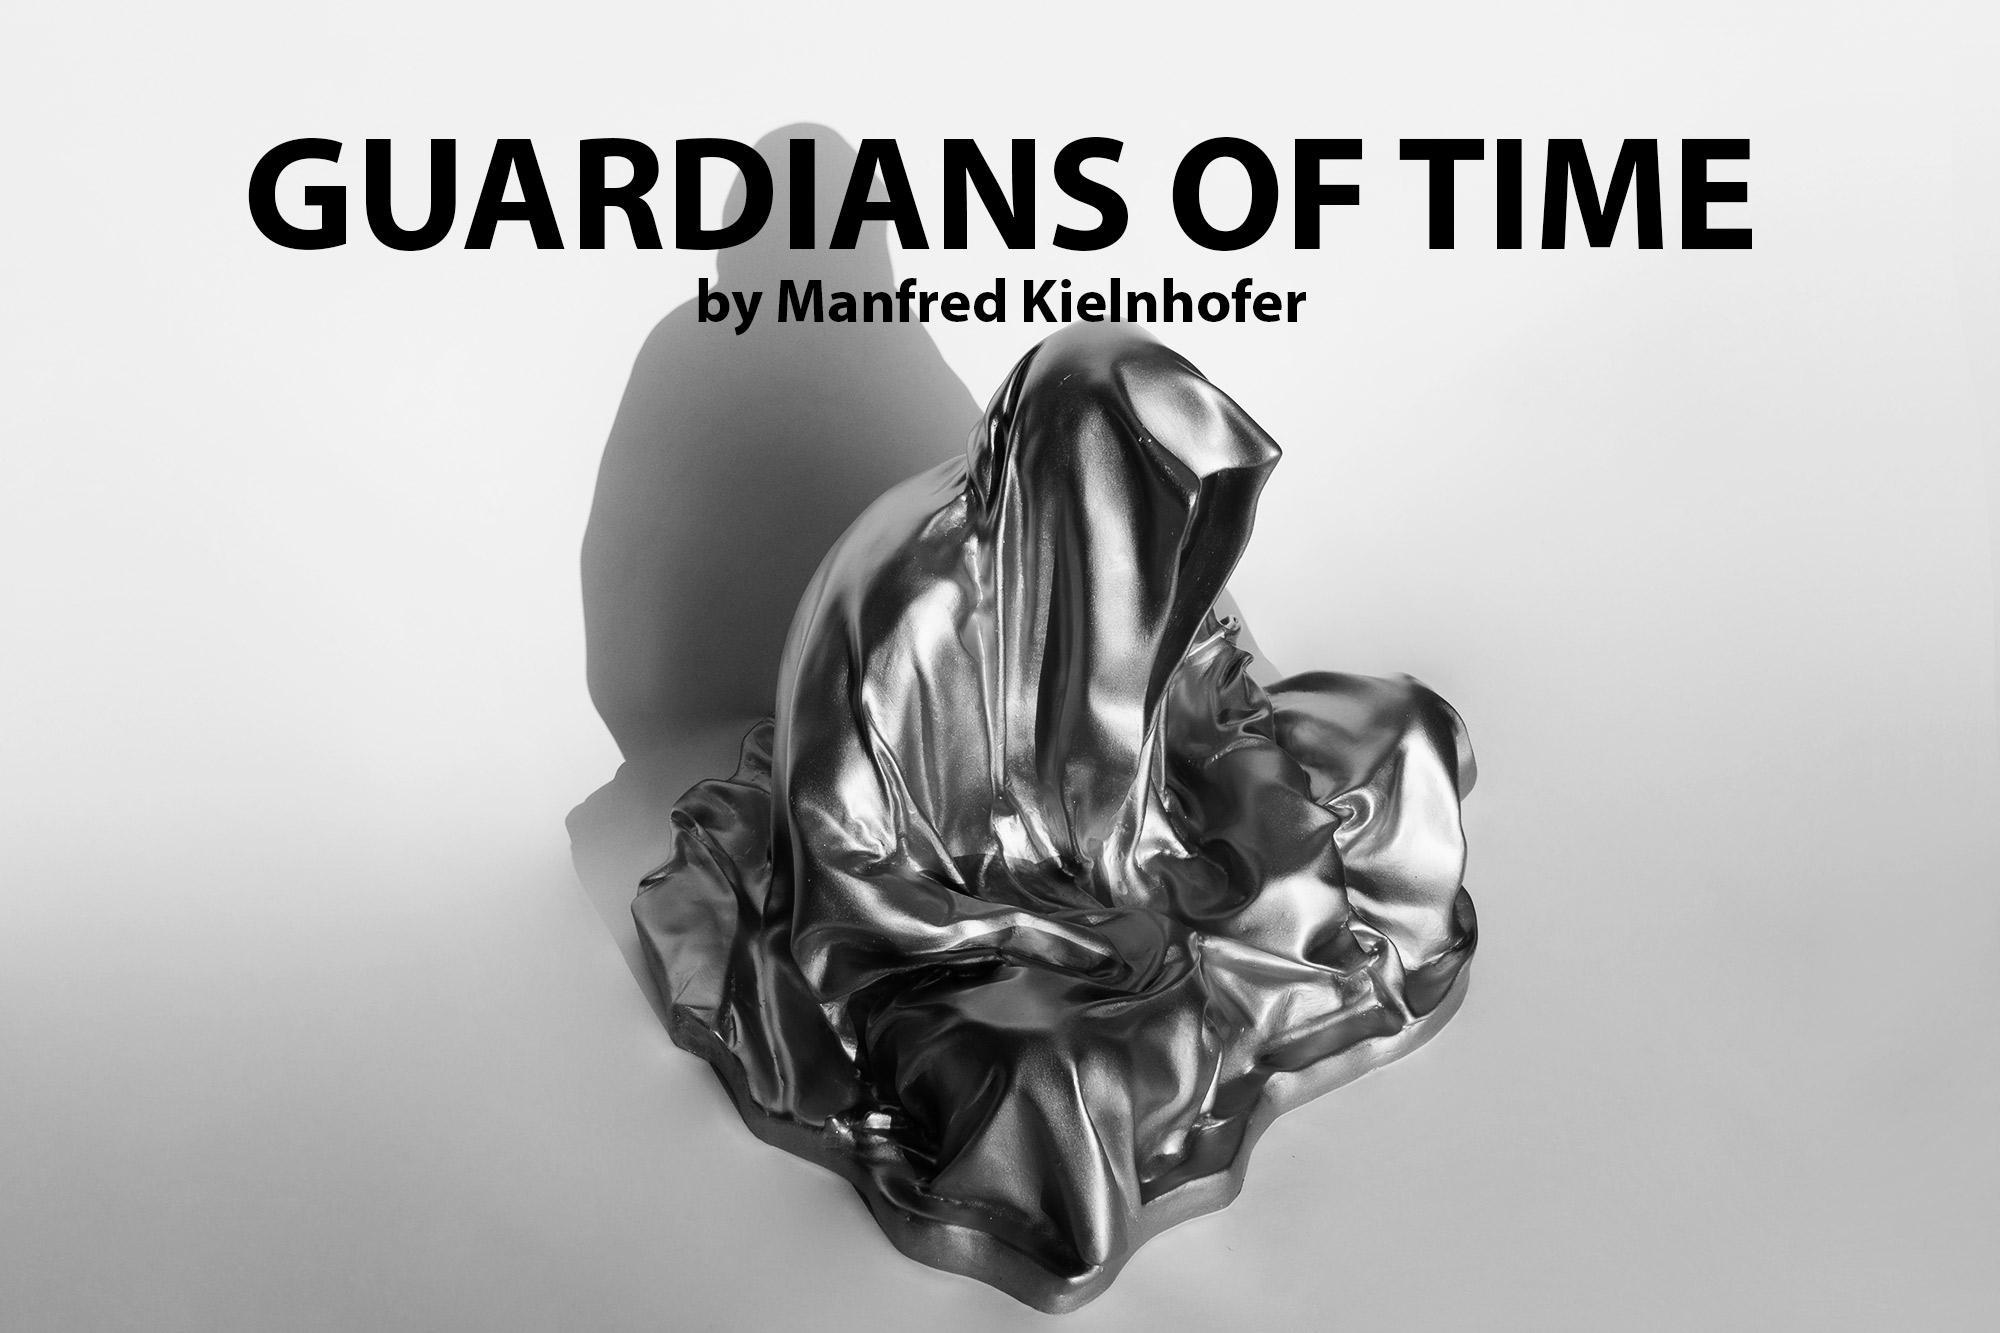 guardians-of-time-manfred-kili-kielnhofer-contemporary-art-fine-arts-modern-design-famouse-statue-sculpture-plastic-gallery-museum-shop-store-faceless-7824y